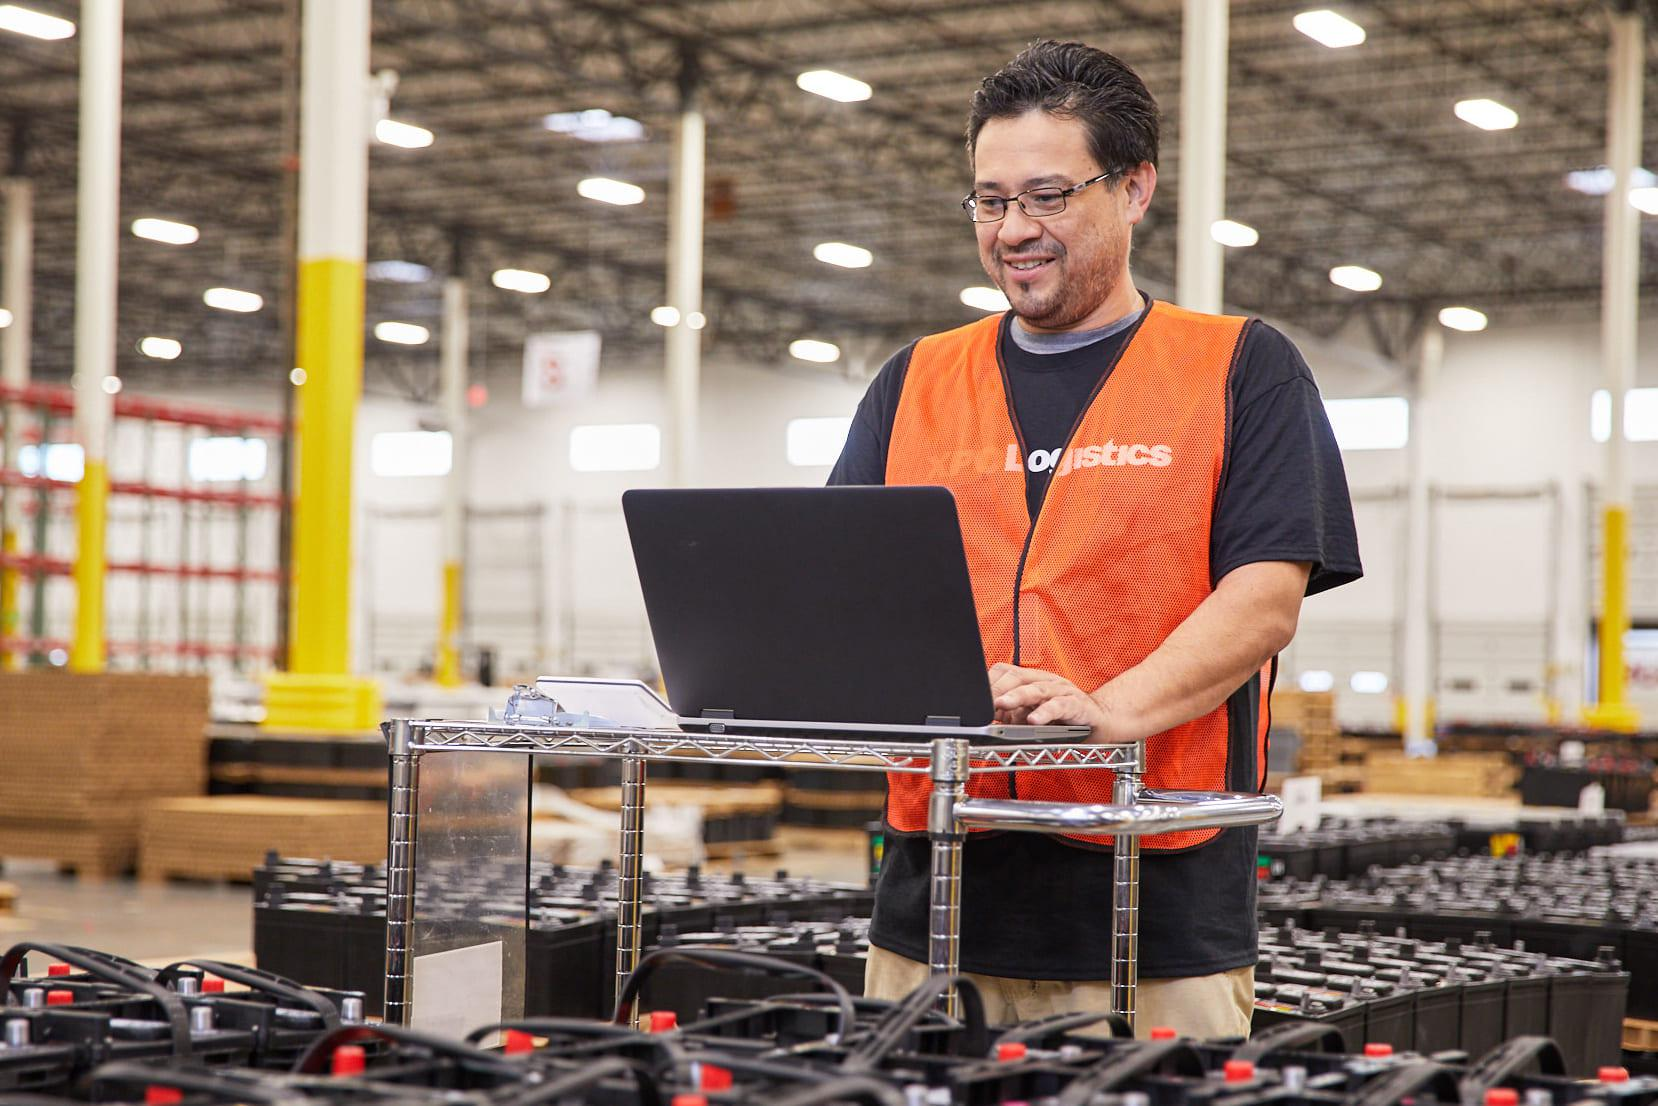 XPO warehouse employee working on computer